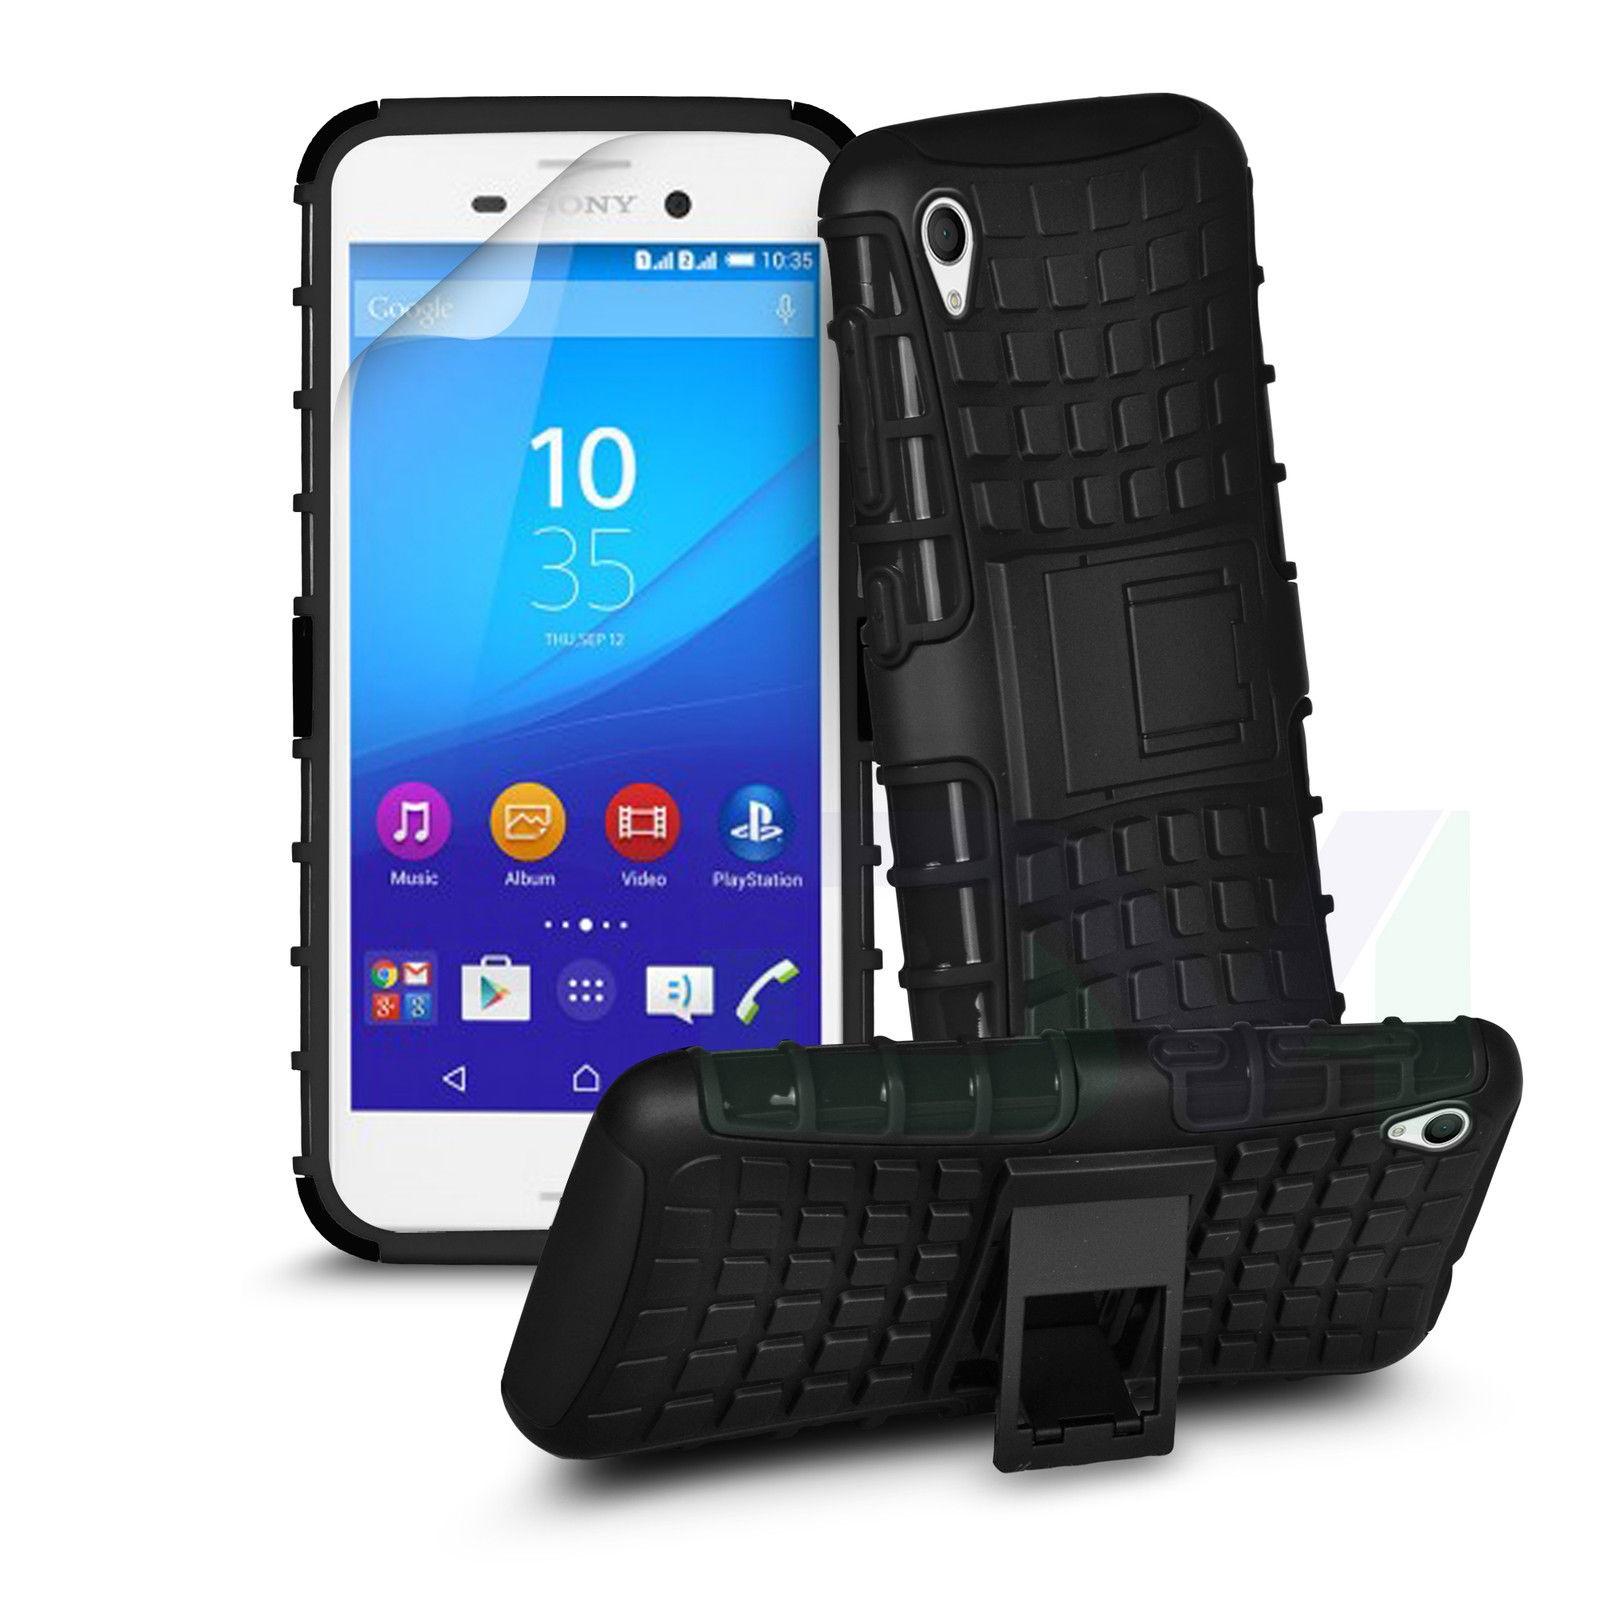 Odolné pouzdro PANZER CASE na mobilní telefon Sony Xperia M4 Aqua Černé